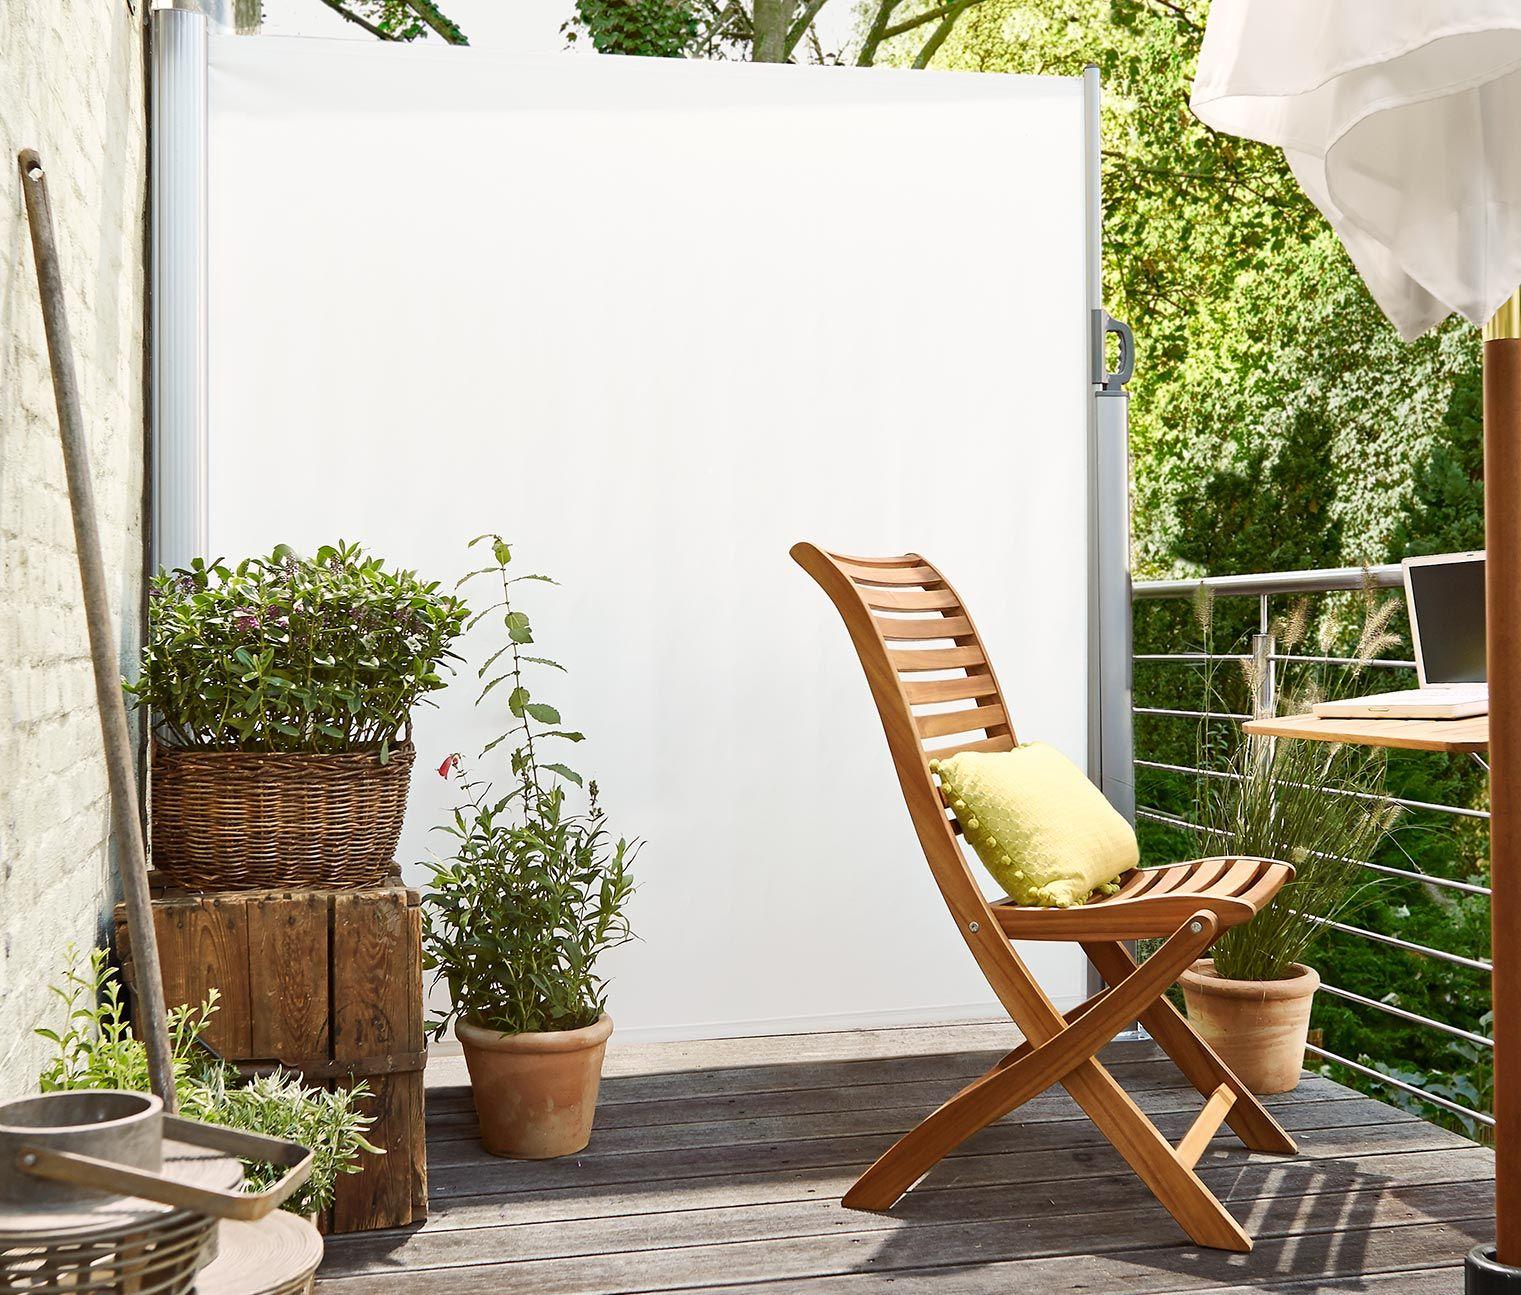 Seitenmarkise Tchibo Gartenmobel Gartenmobel Und Ikea Balkonmobel